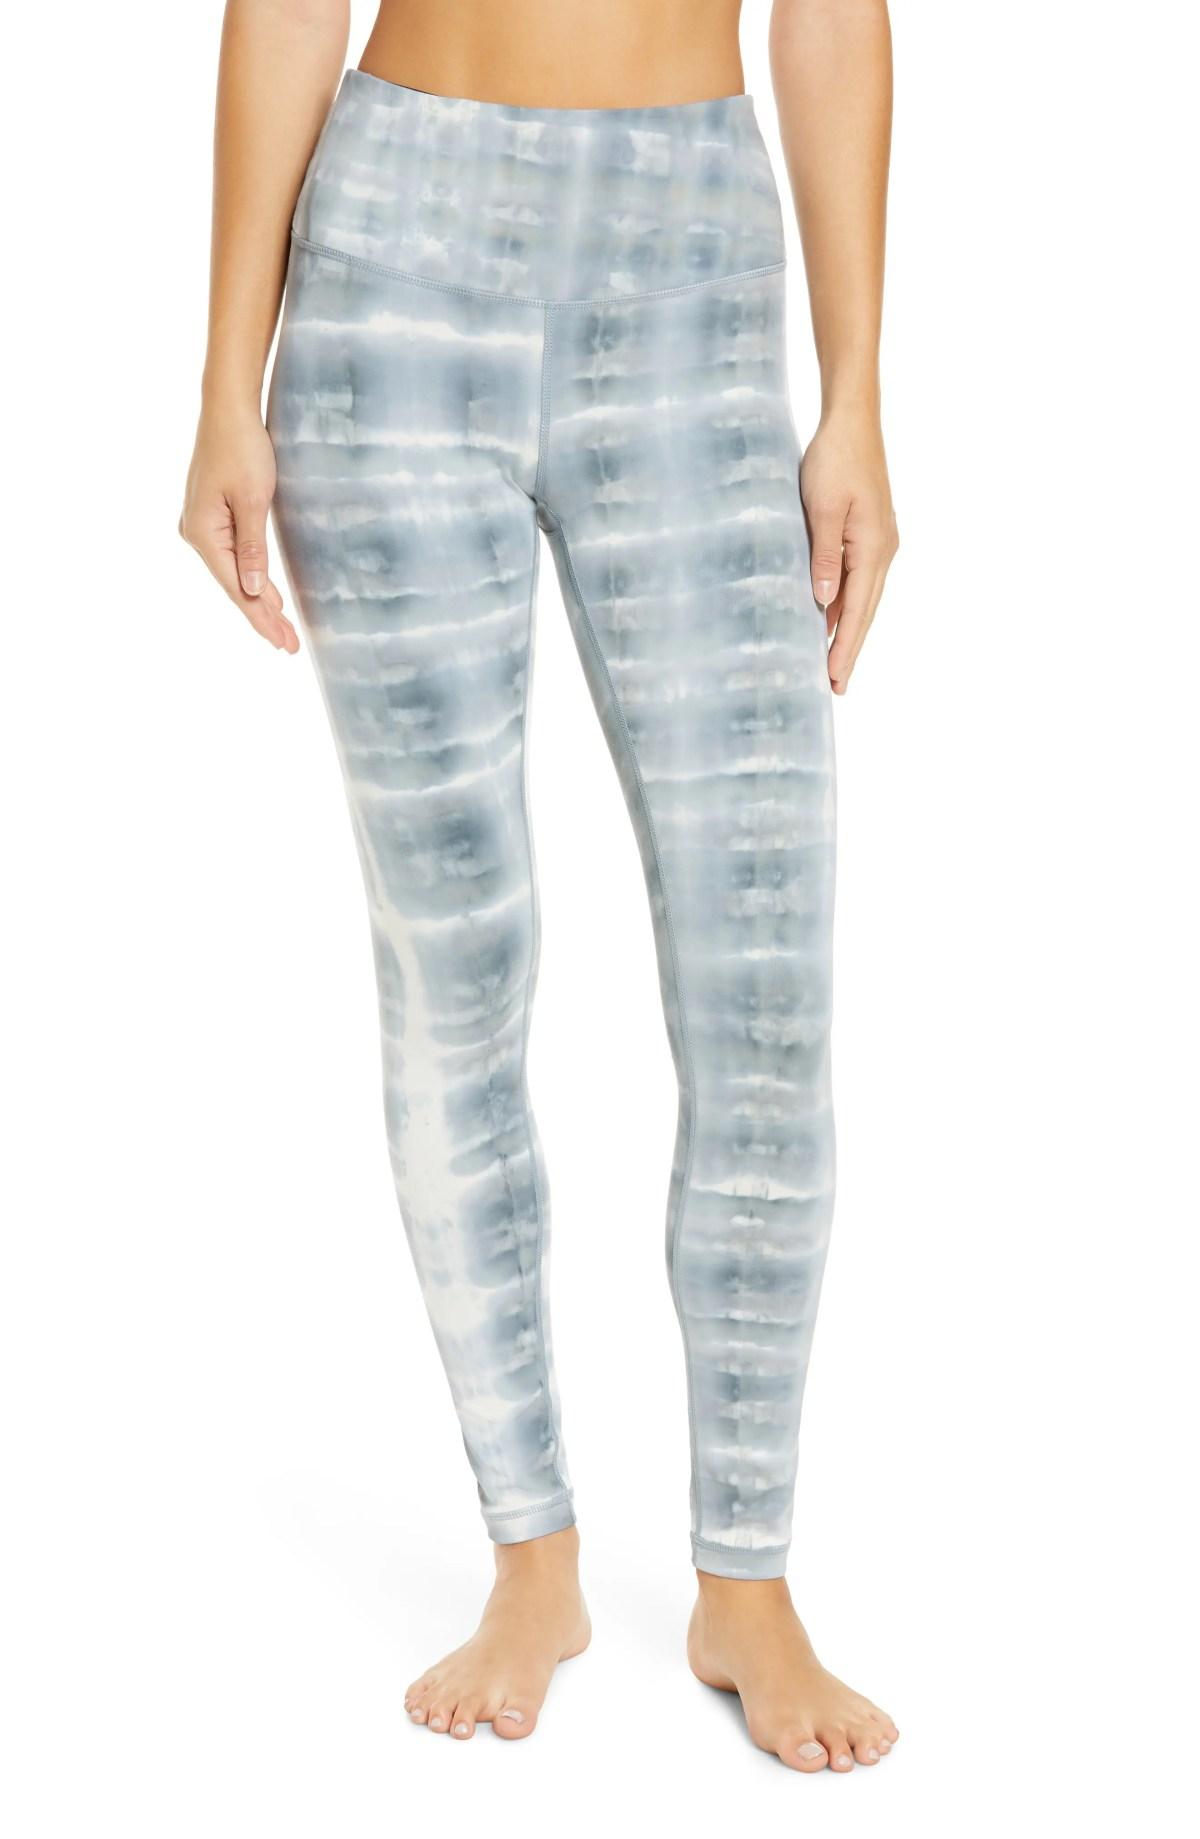 ZELLA Spray Dye High Waist Leggings, Main, color, BLUE WEATHER